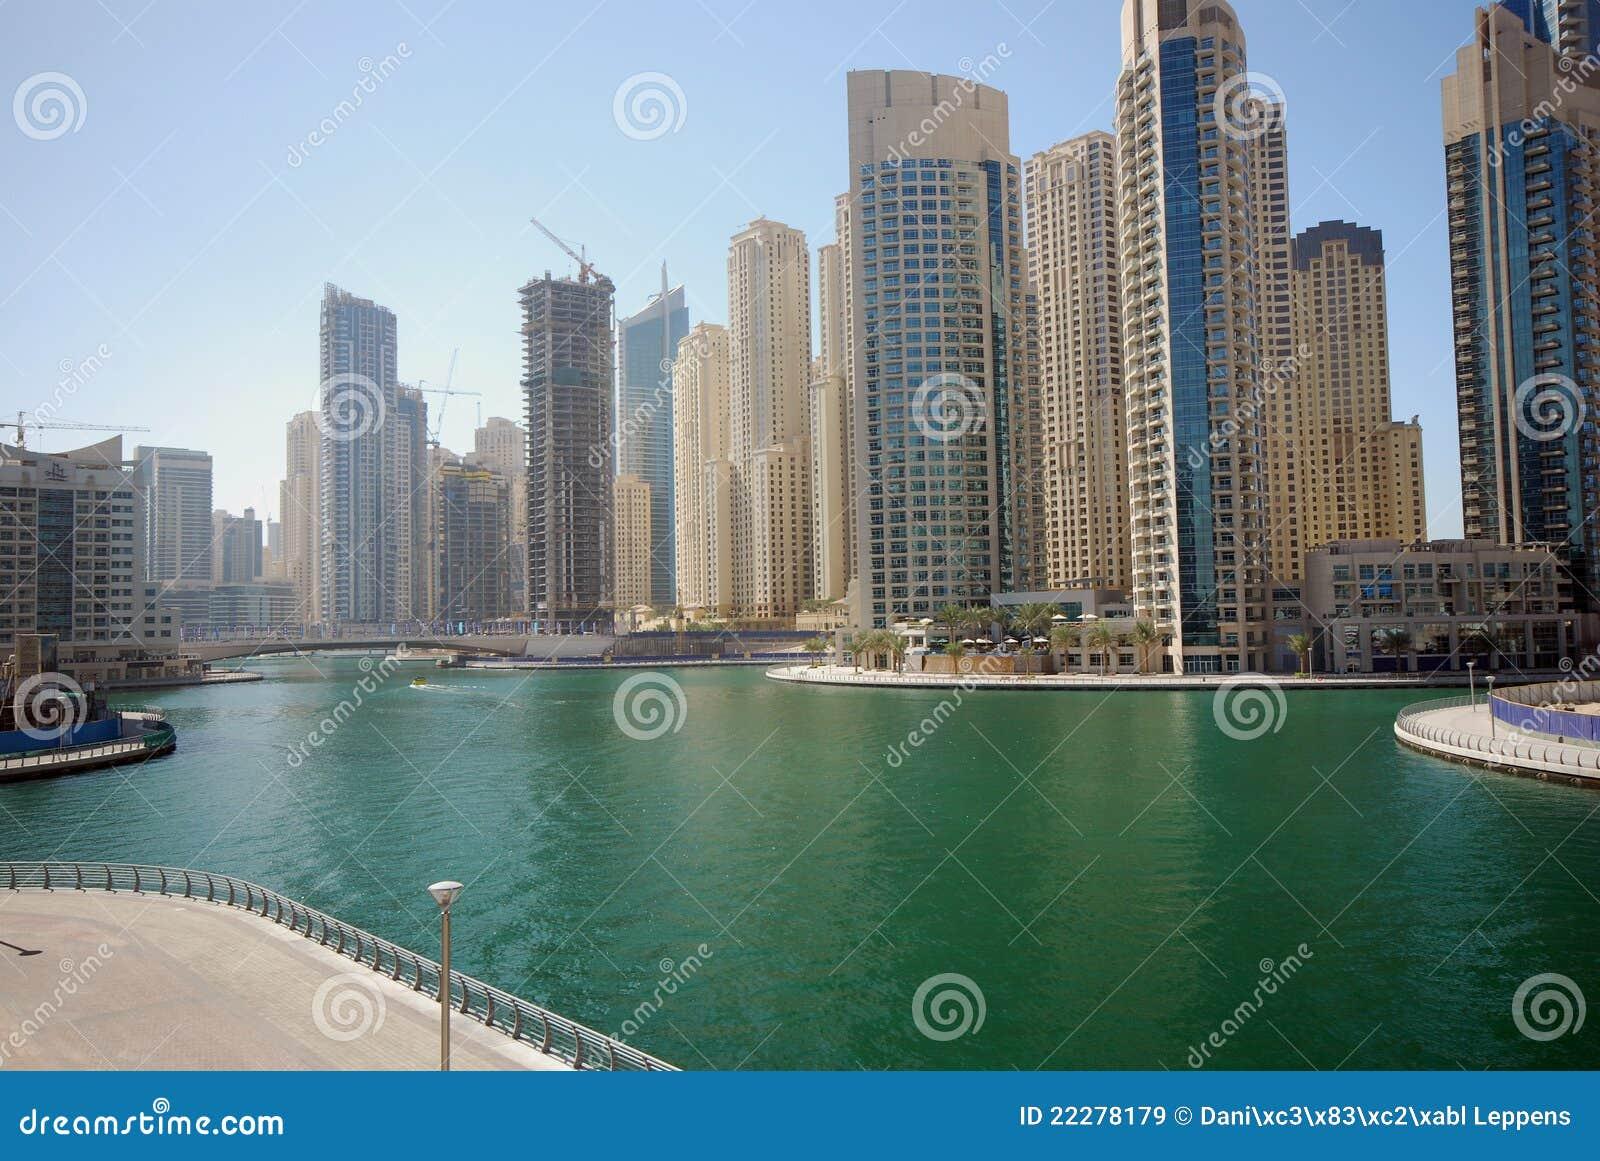 Dubai marina royalty free stock images image 22278179 for Dubai architecture moderne